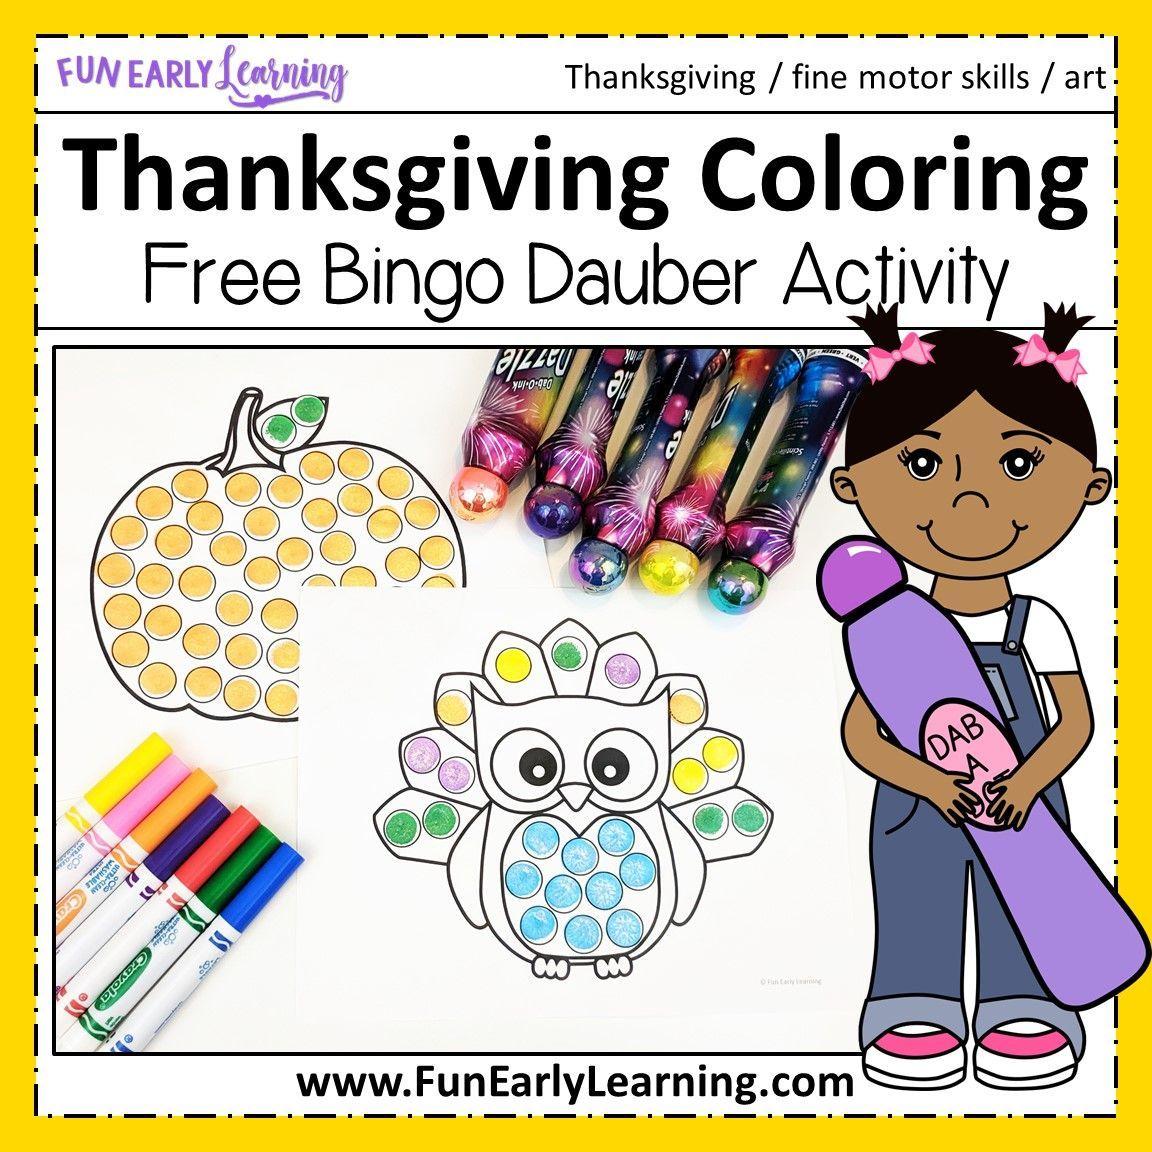 Thanksgiving Bingo Dauber Coloring Pages